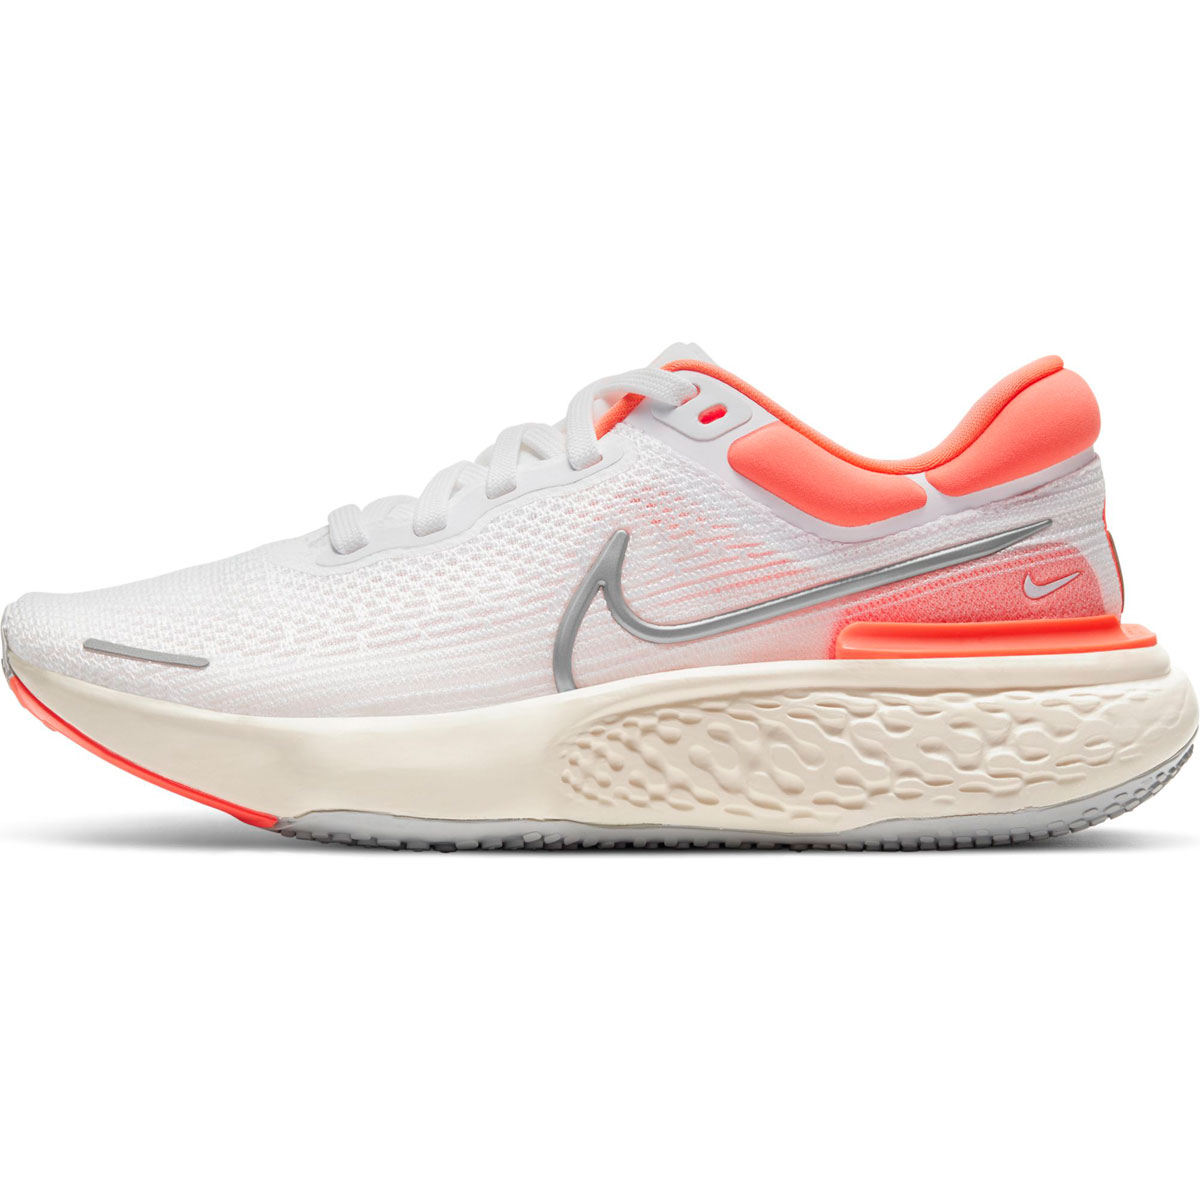 Women's Nike Zoomx Invincible Run FlyKnit Running Shoe - Color: White/Metallic Silver/Bright Mango - Size: 5 - Width: Regular, White/Metallic Silver/Bright Mango, large, image 2